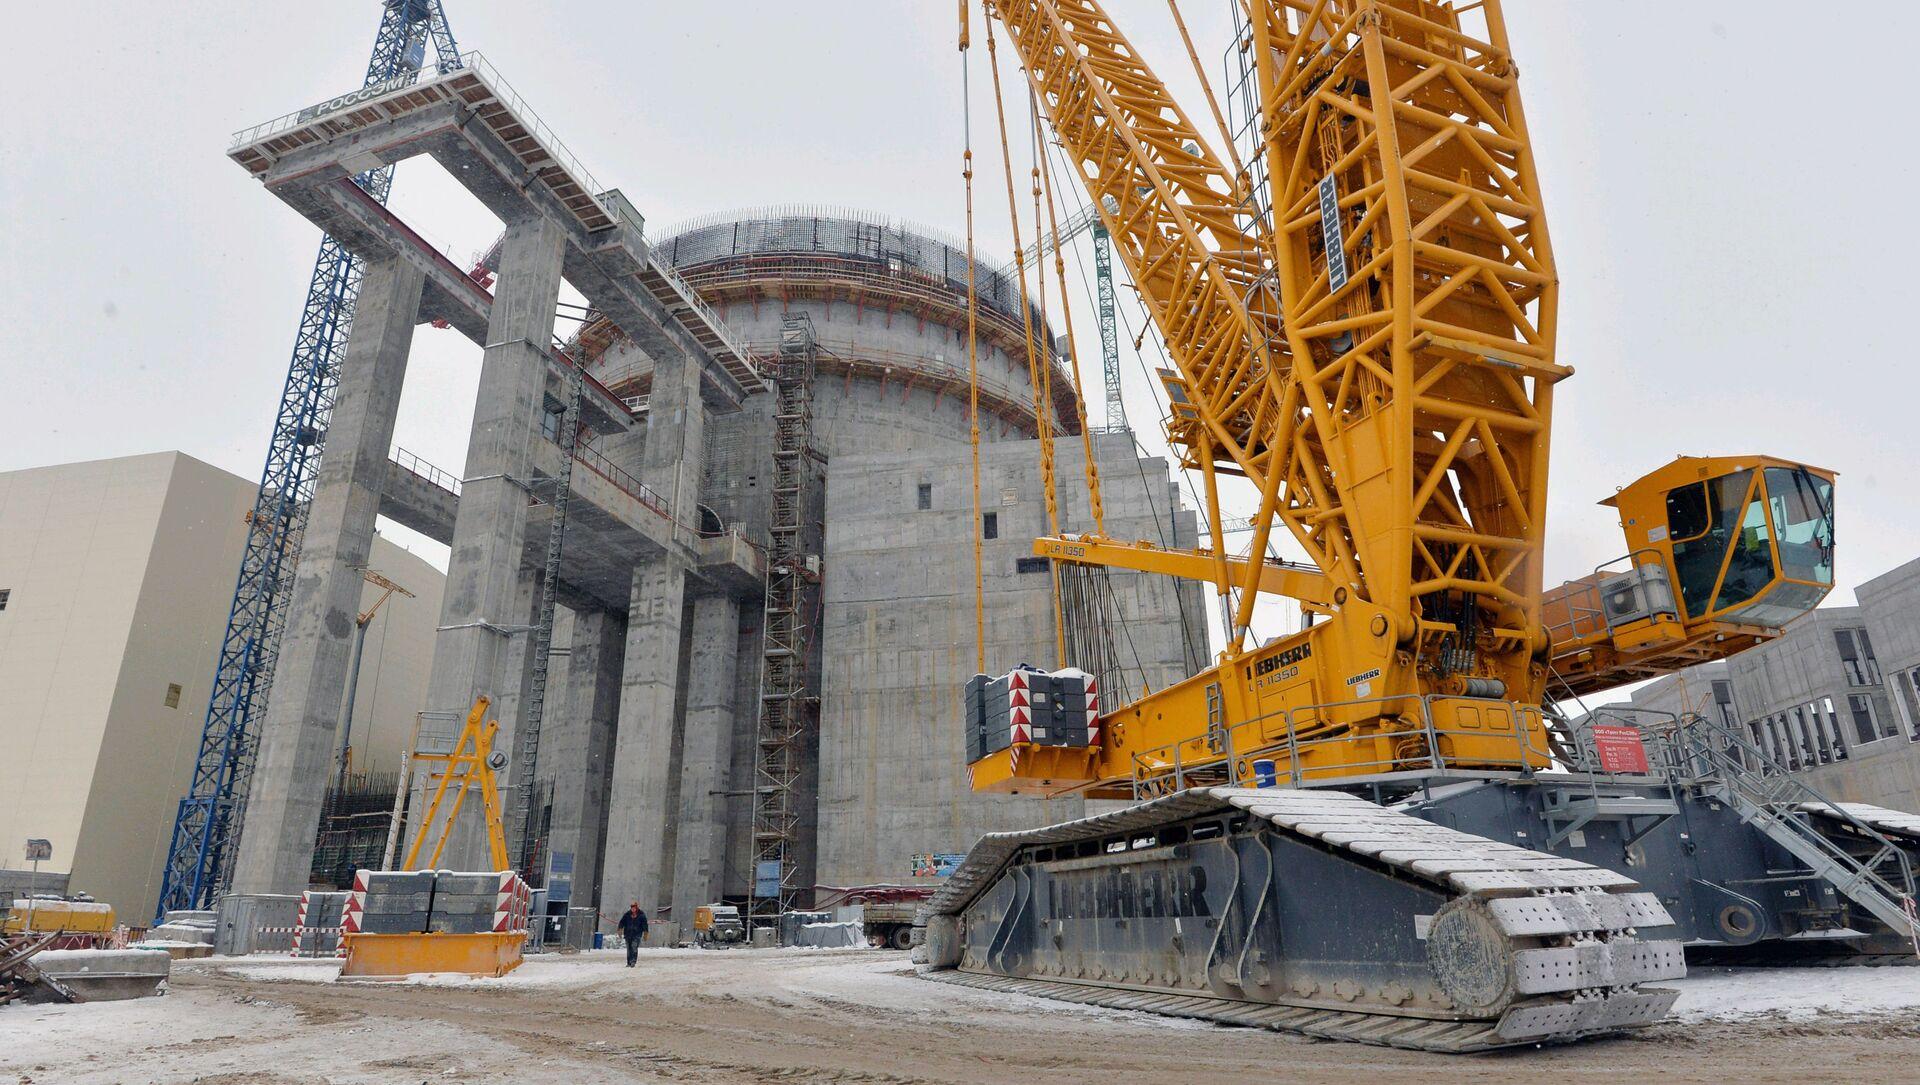 Izgradnja beloruske nuklearne elektrane - Sputnik Srbija, 1920, 30.05.2021